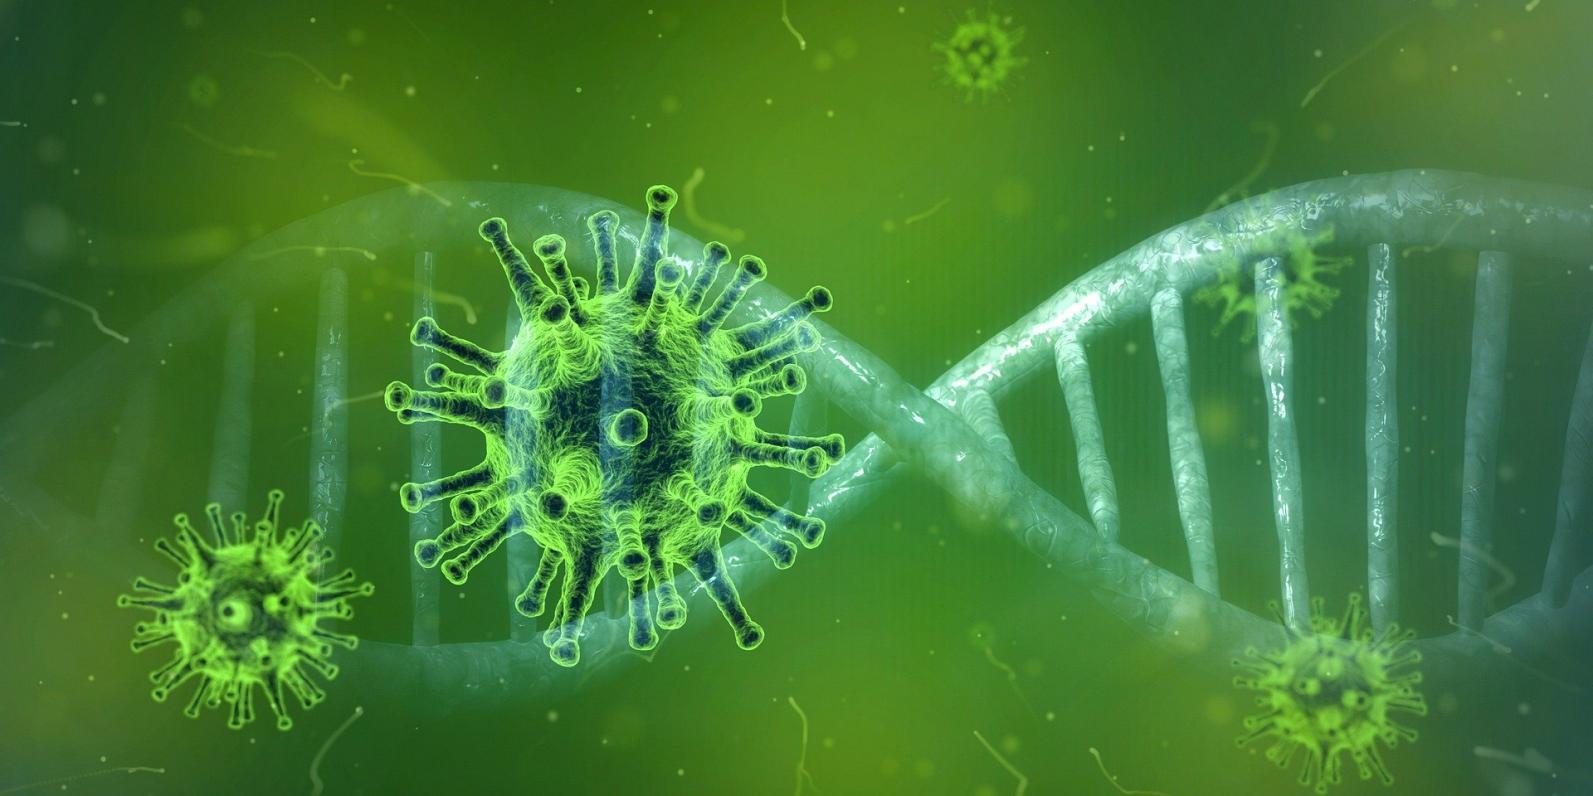 Governo de SP apresenta menor taxa de letalidade desde o início da pandemia de Covid-19